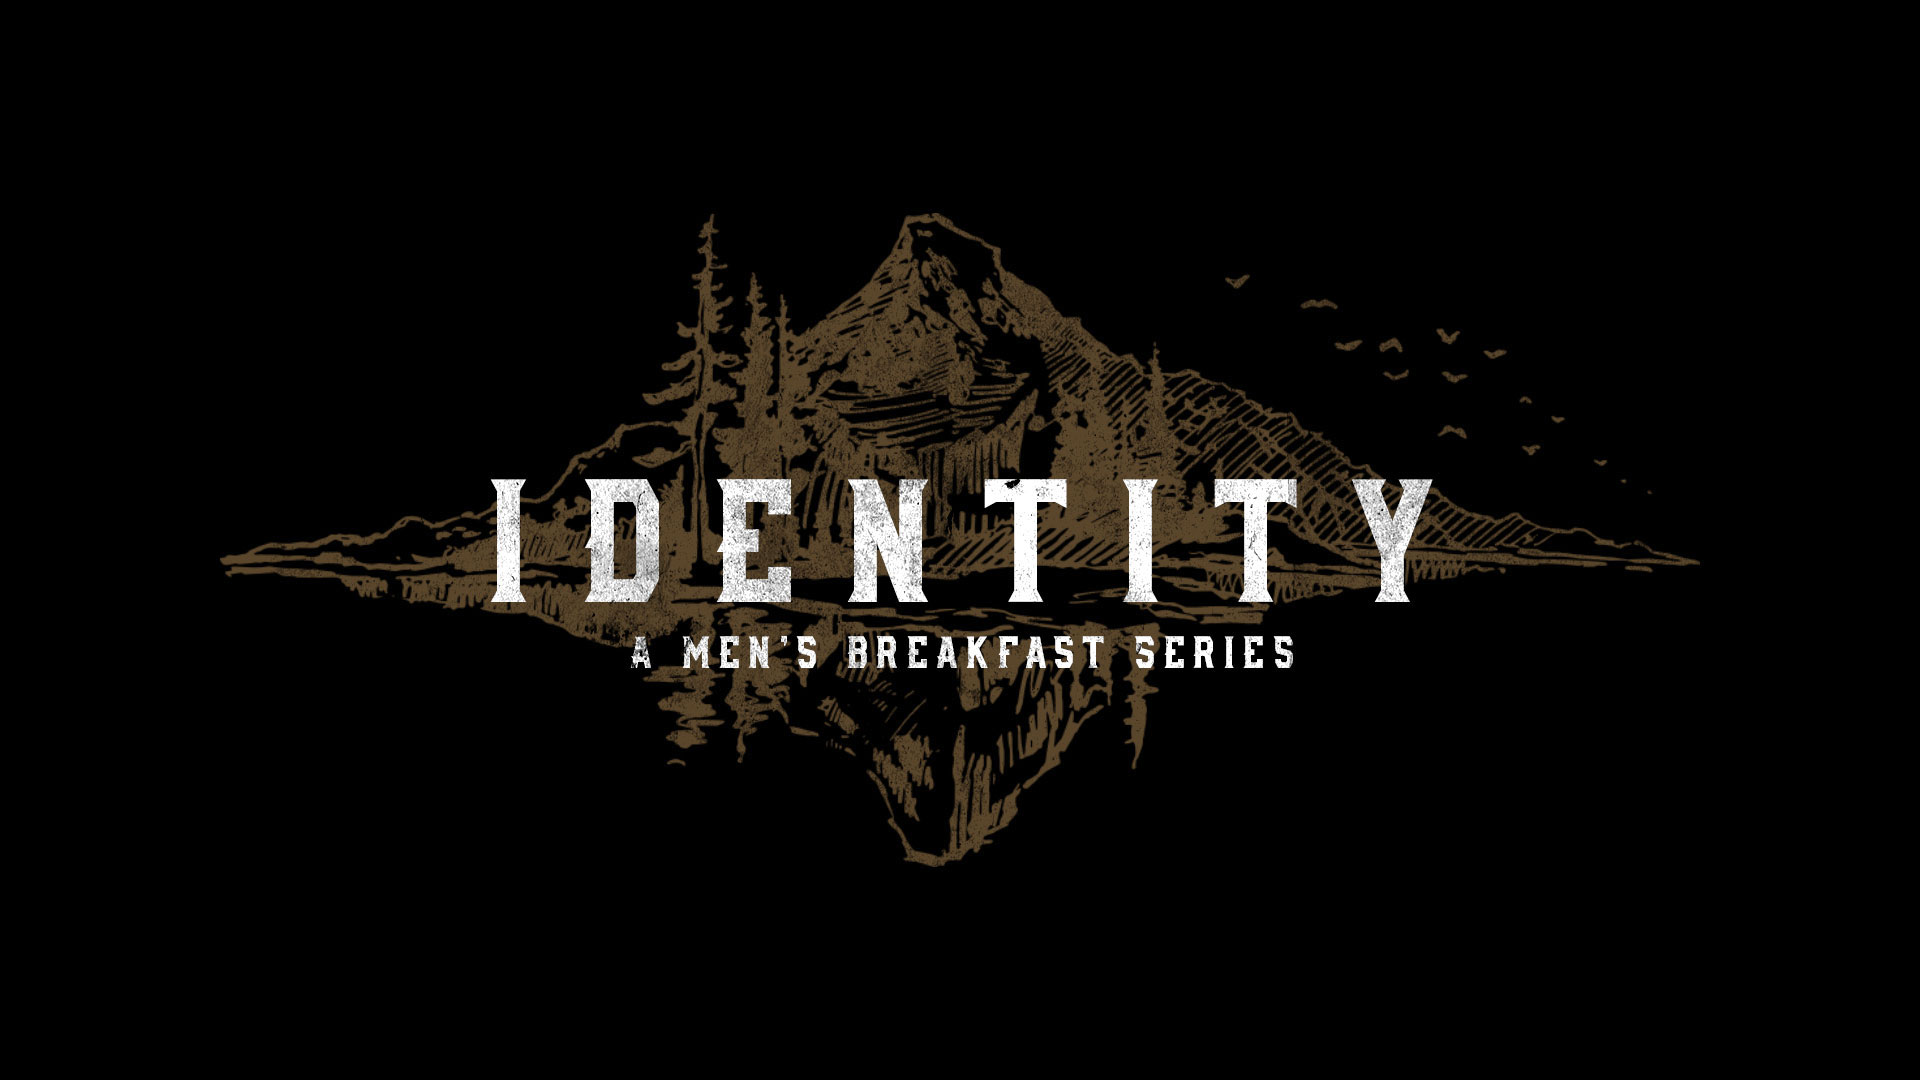 Series: Men's Breakfast Series: Identity